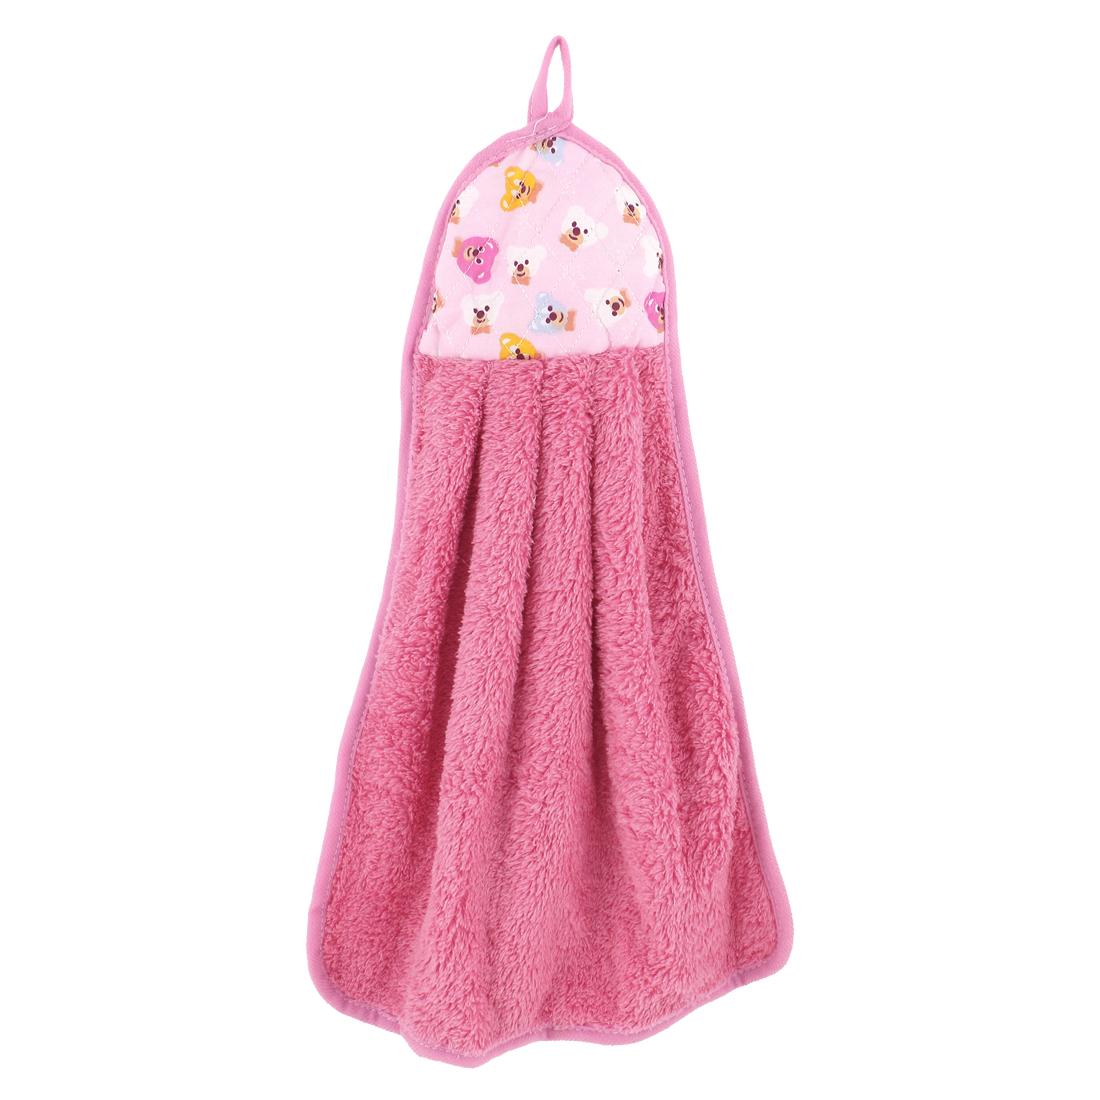 Bathroom Kitchen Pink Animal Pattern Wall Hanging Washing Hand Drying Towel Washcloth